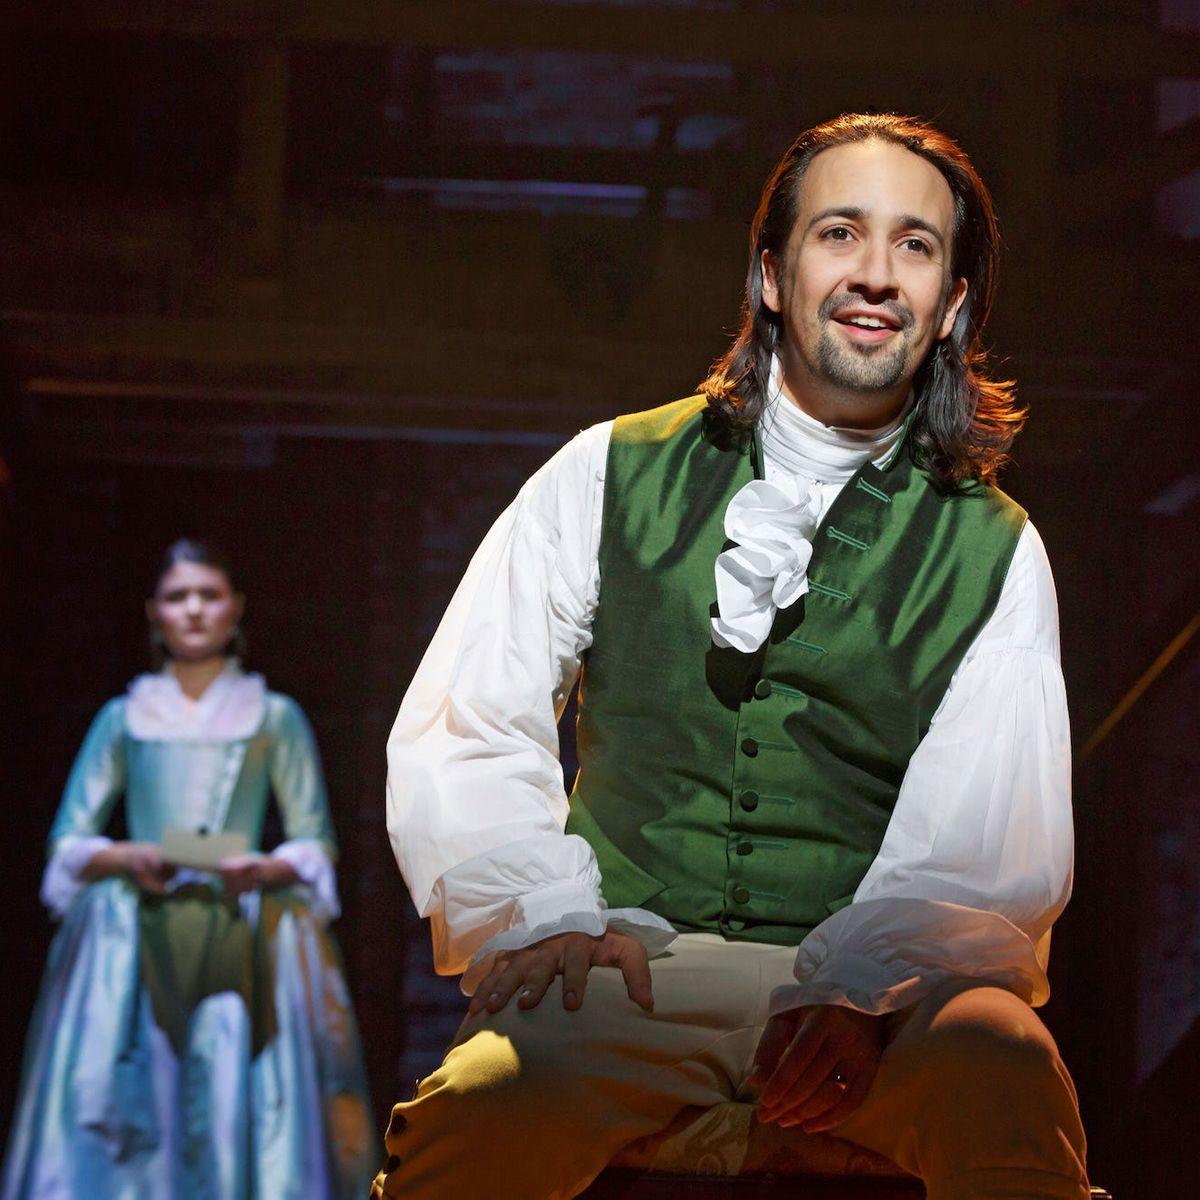 Alexander Hamilton portrayed by Lin-Manuel Miranda - Alexander Hamilton Fizz - A Hamilton Themed Cocktail